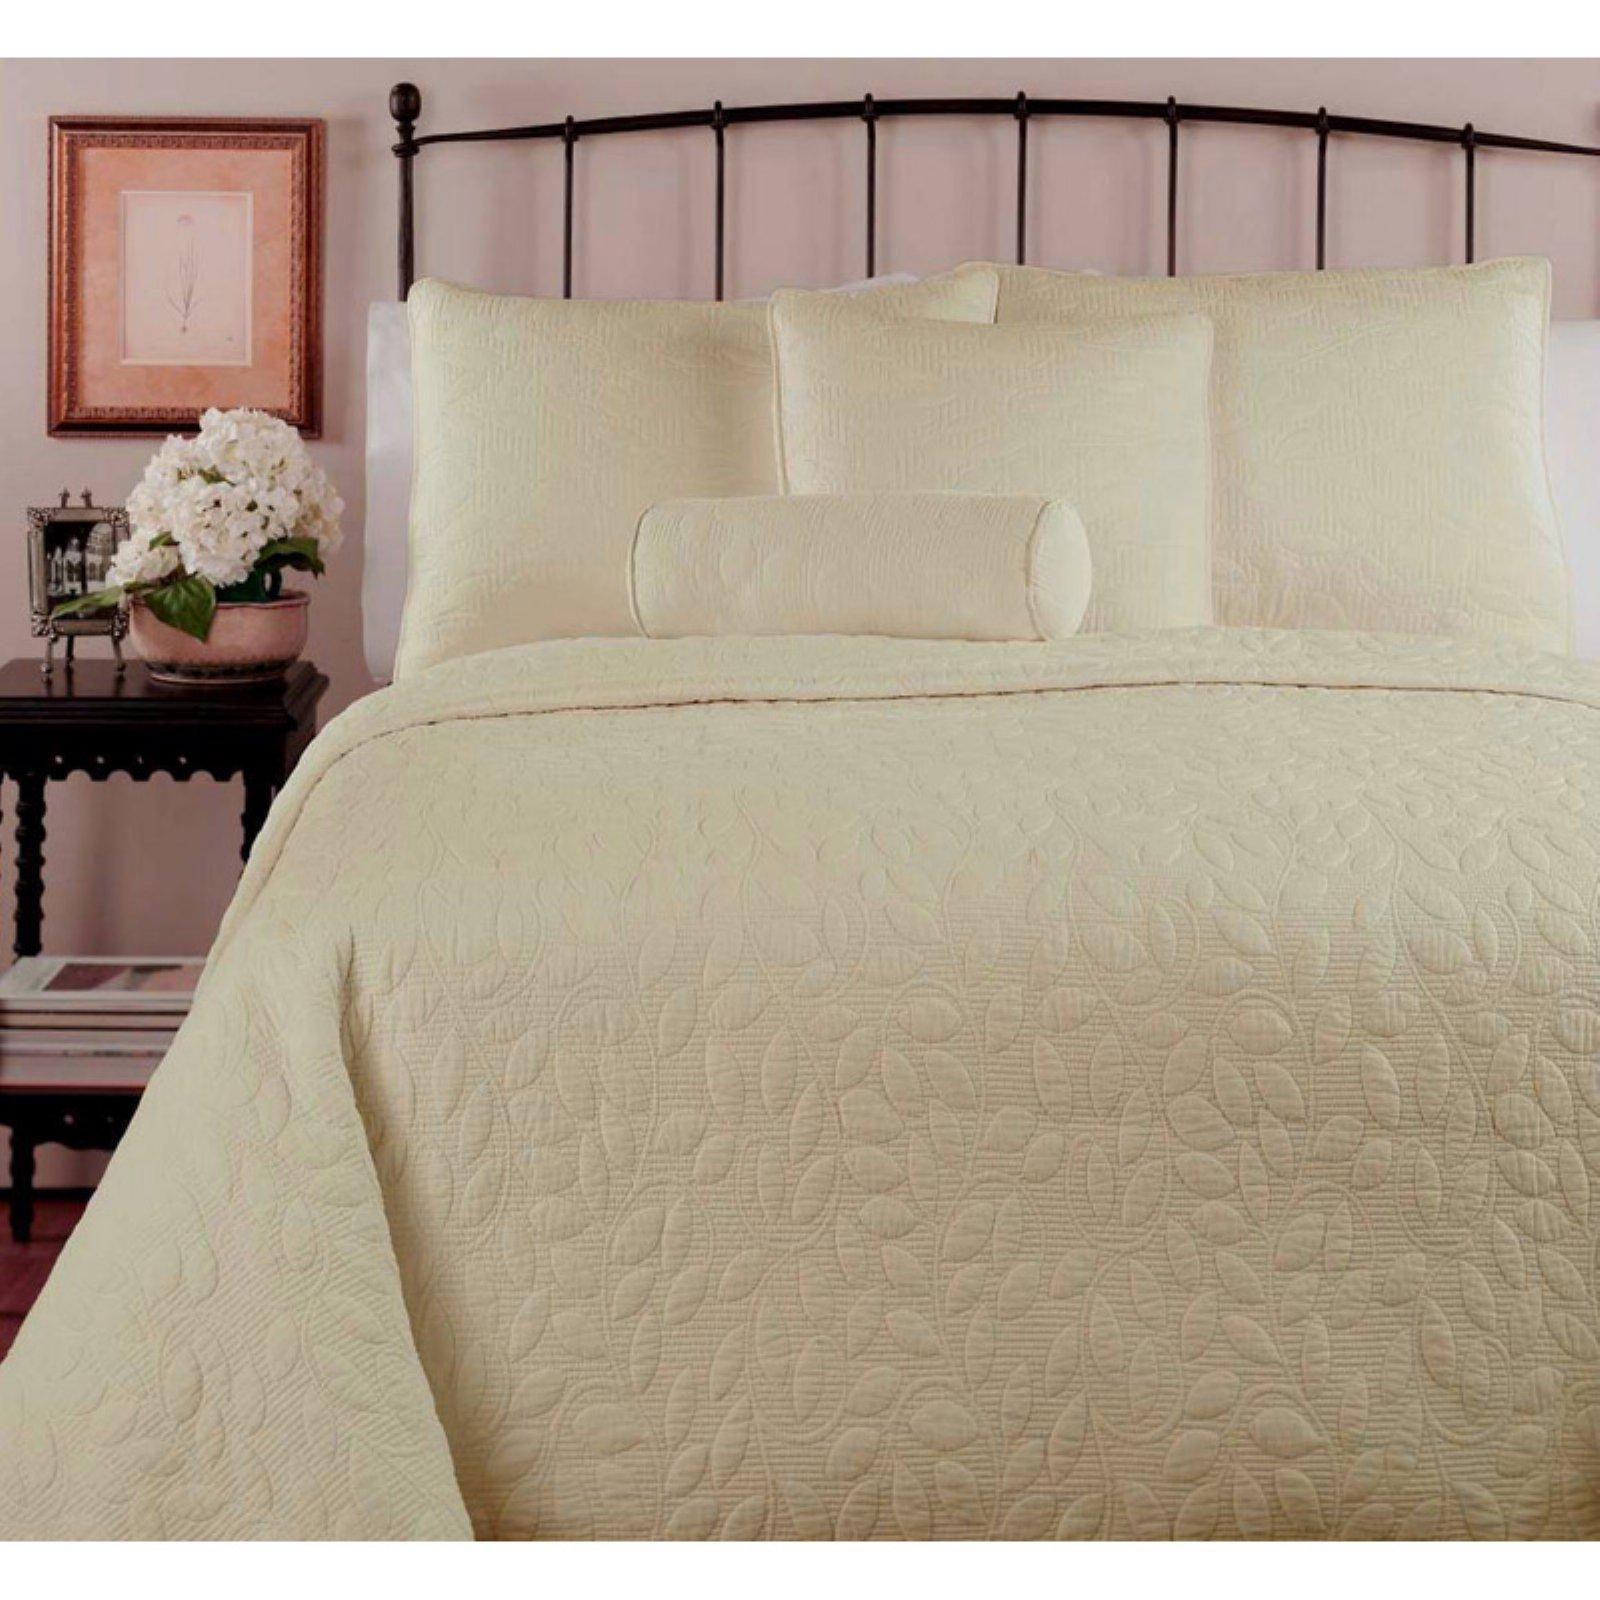 Leafy Floral Matelasse 3 Piece Bedspread Set by Tache Home Fashion